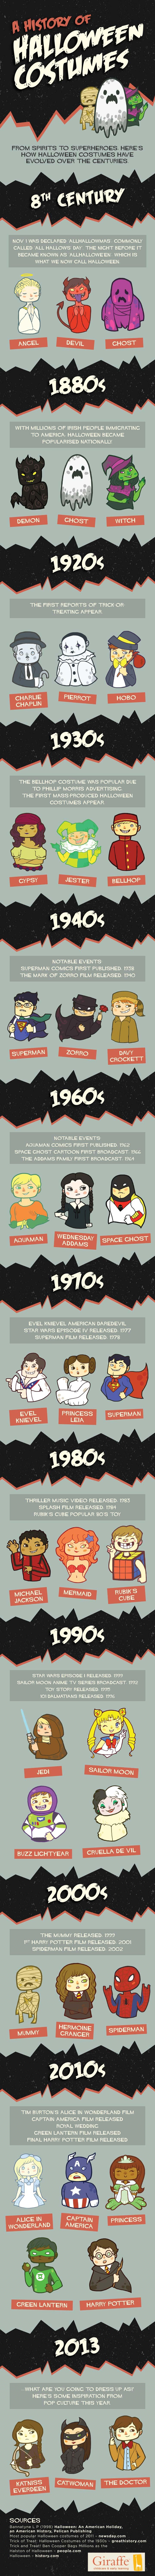 Halloween Costumes History-Infographic